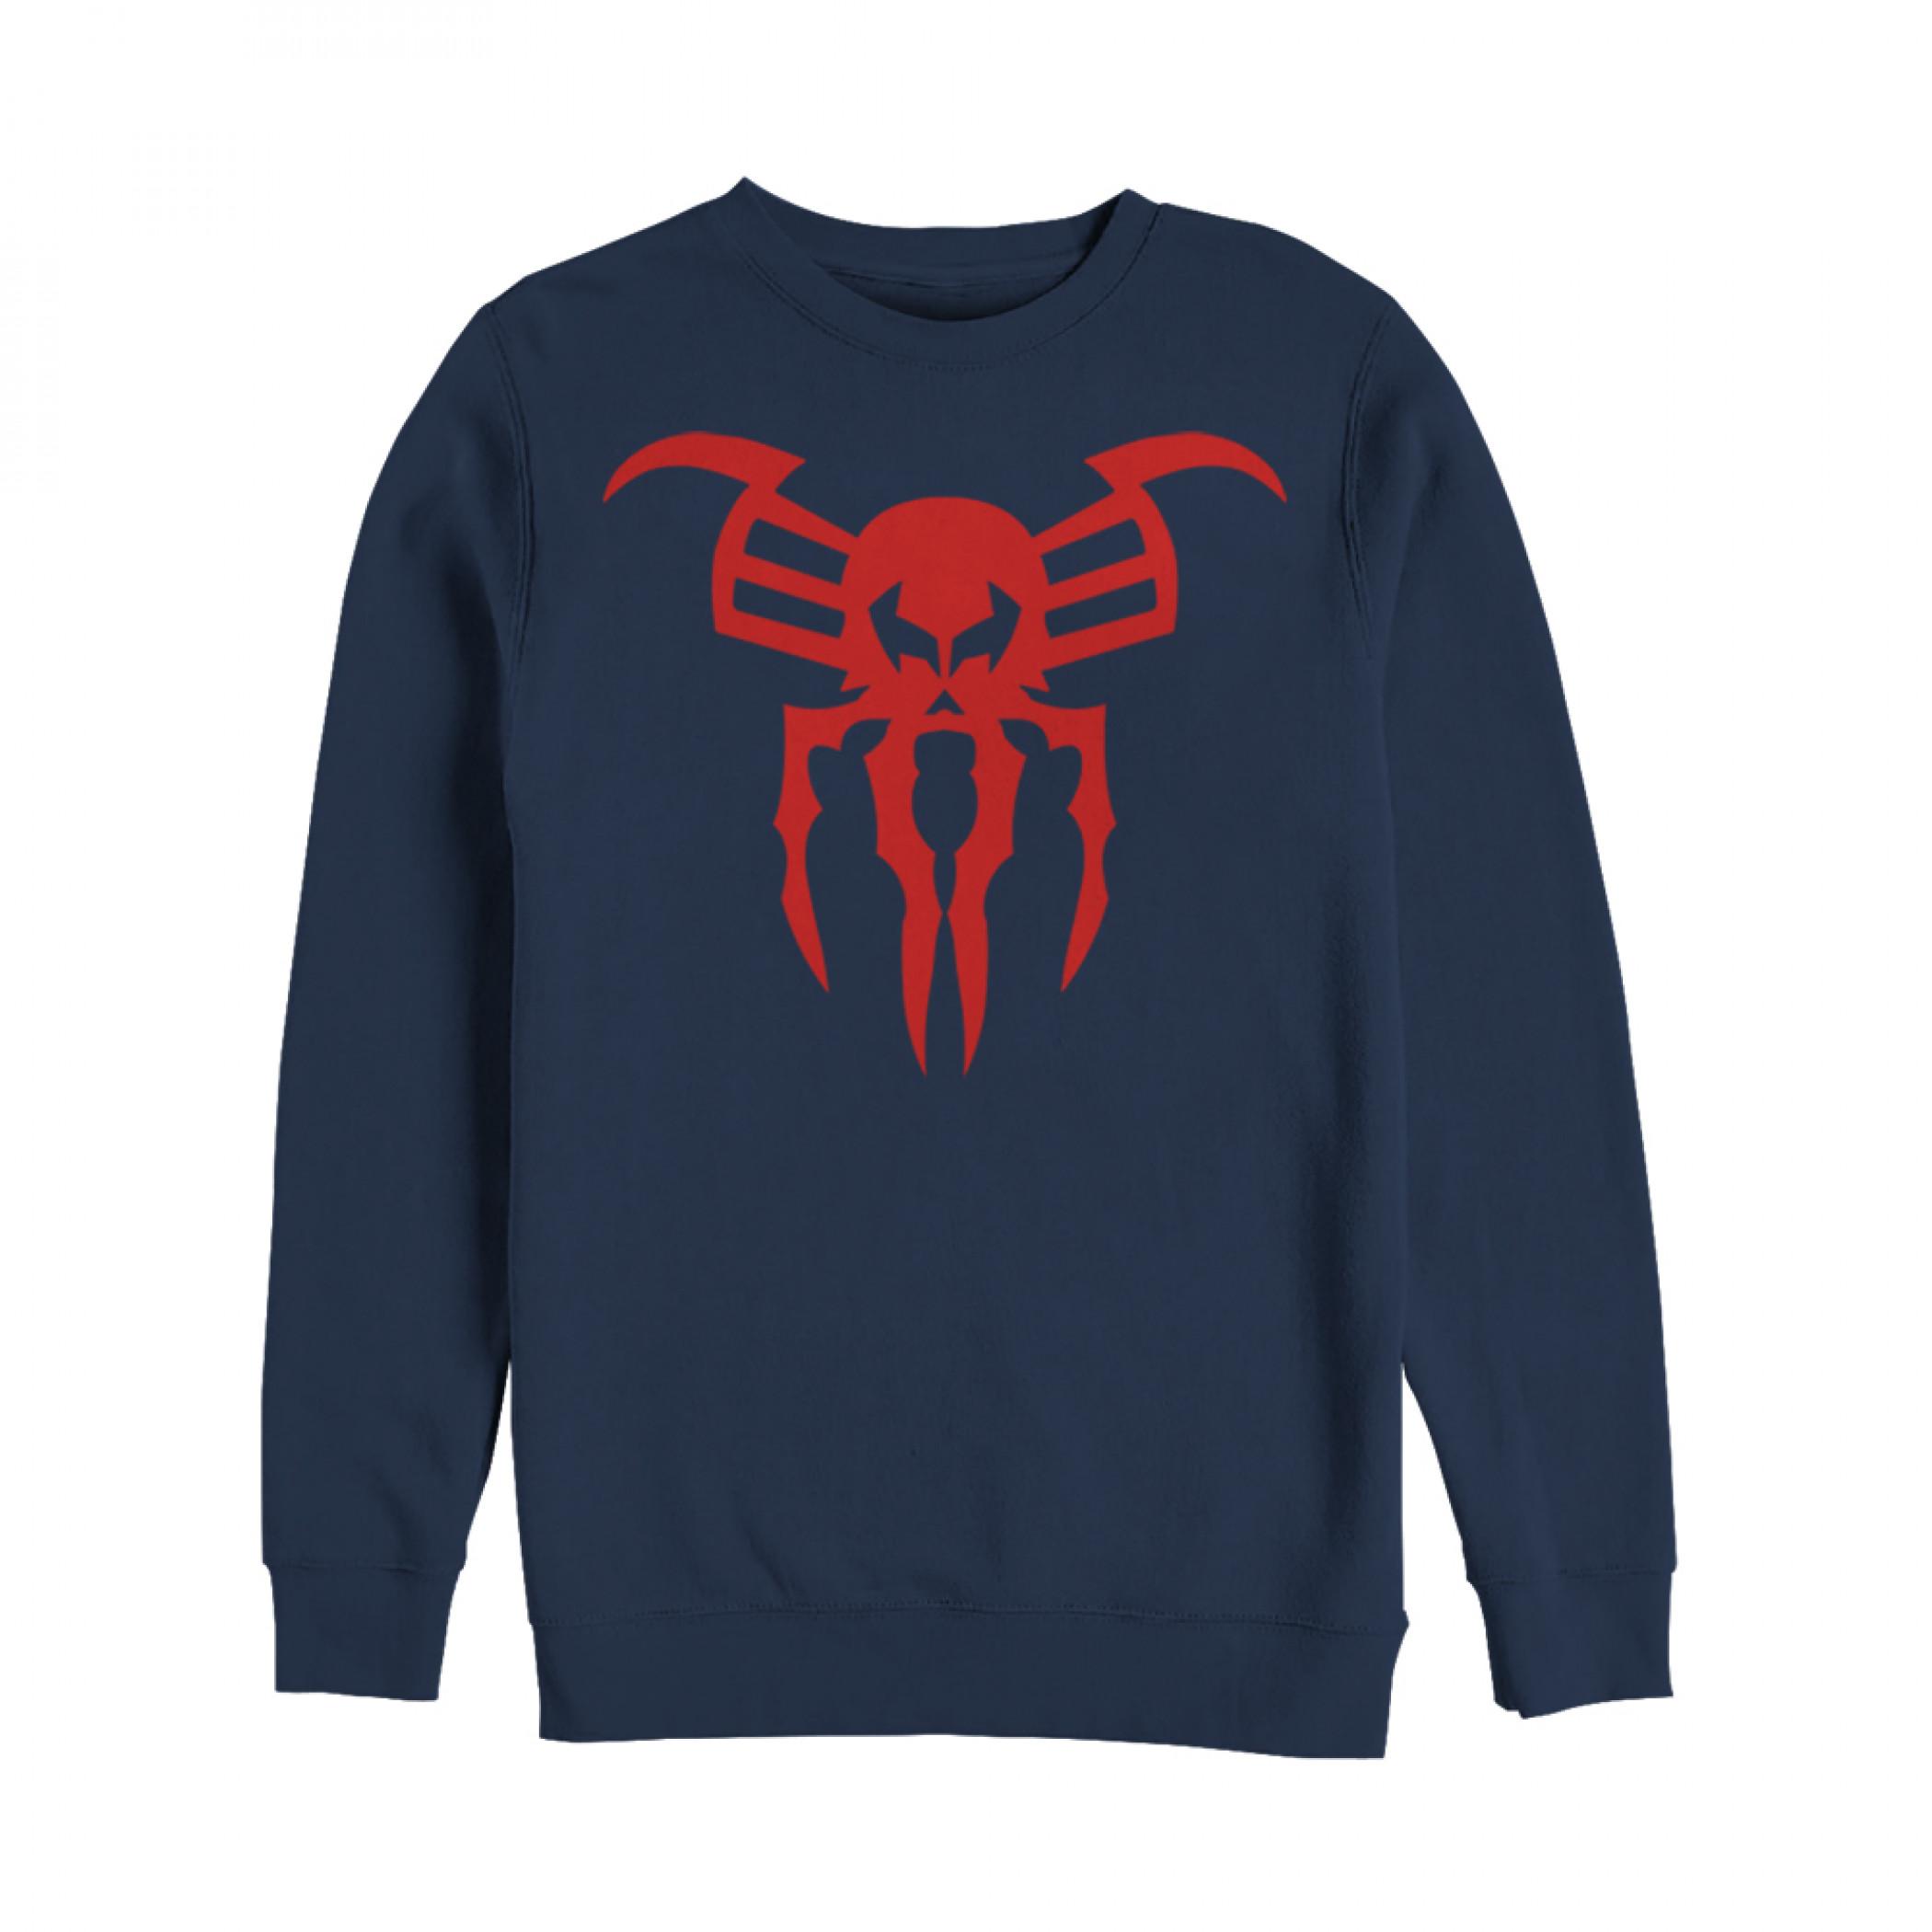 Marvel Spider-Man Original 1999 Logo Sweatshirt